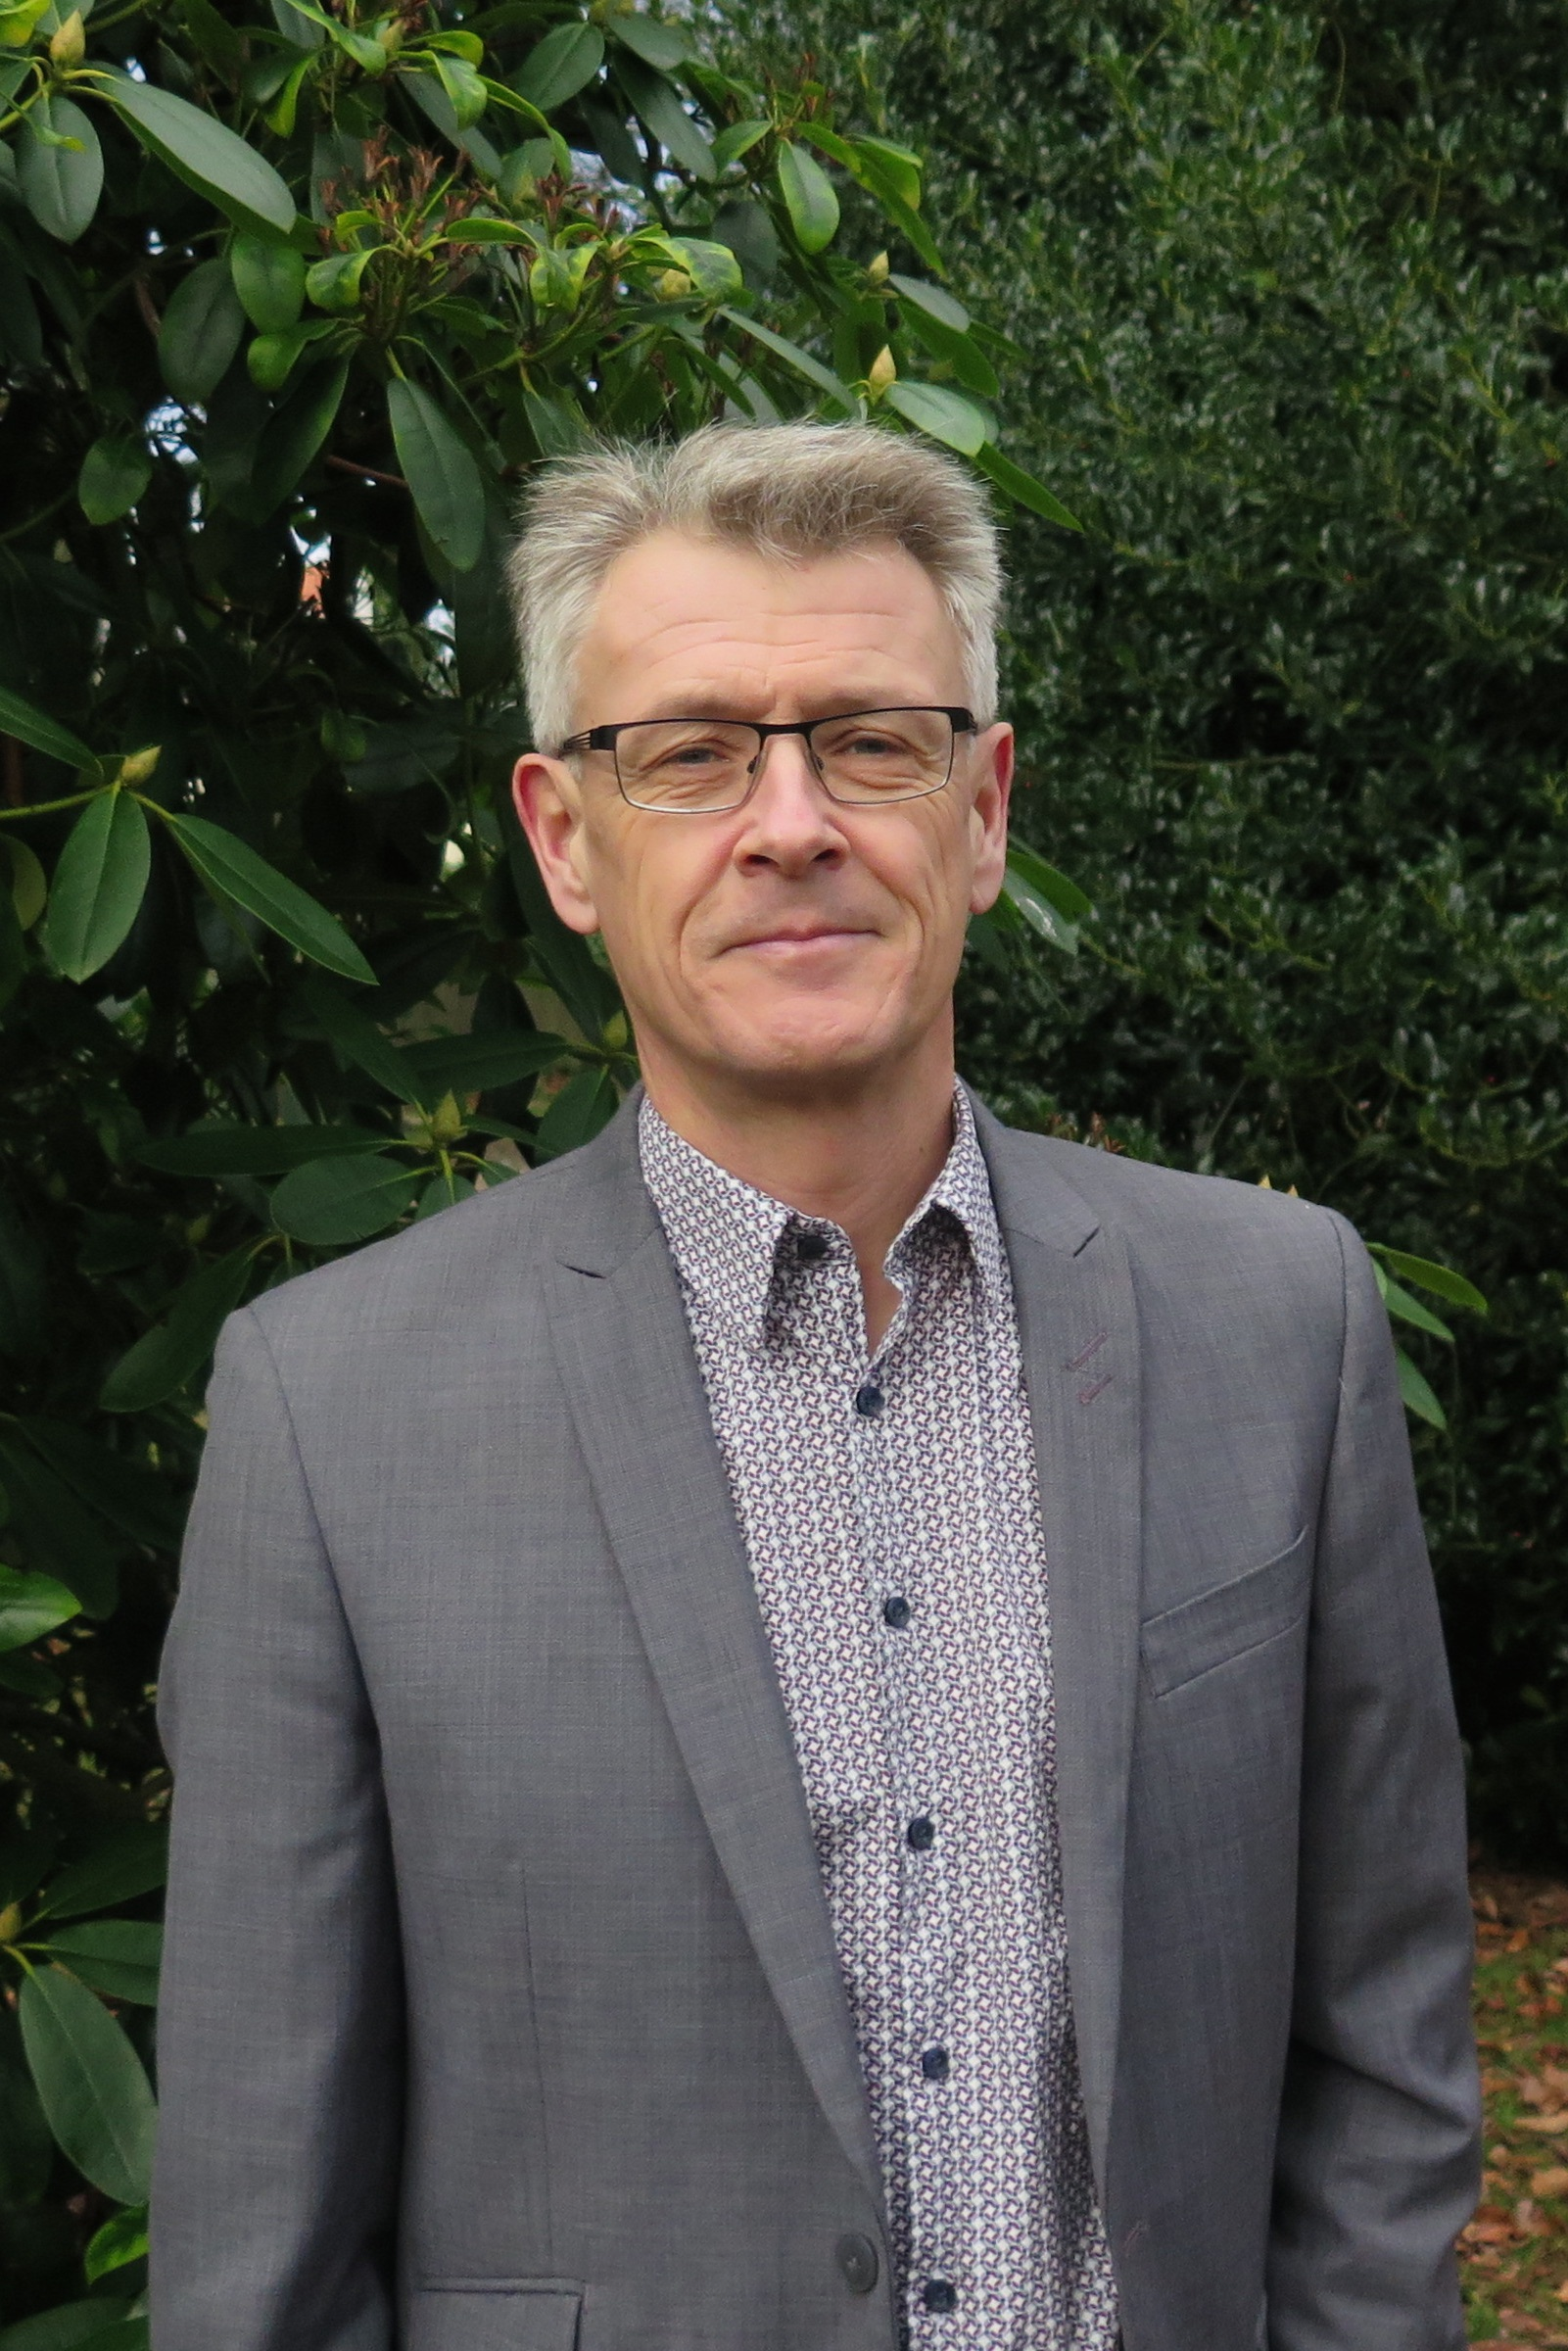 Niels Wium Olesen